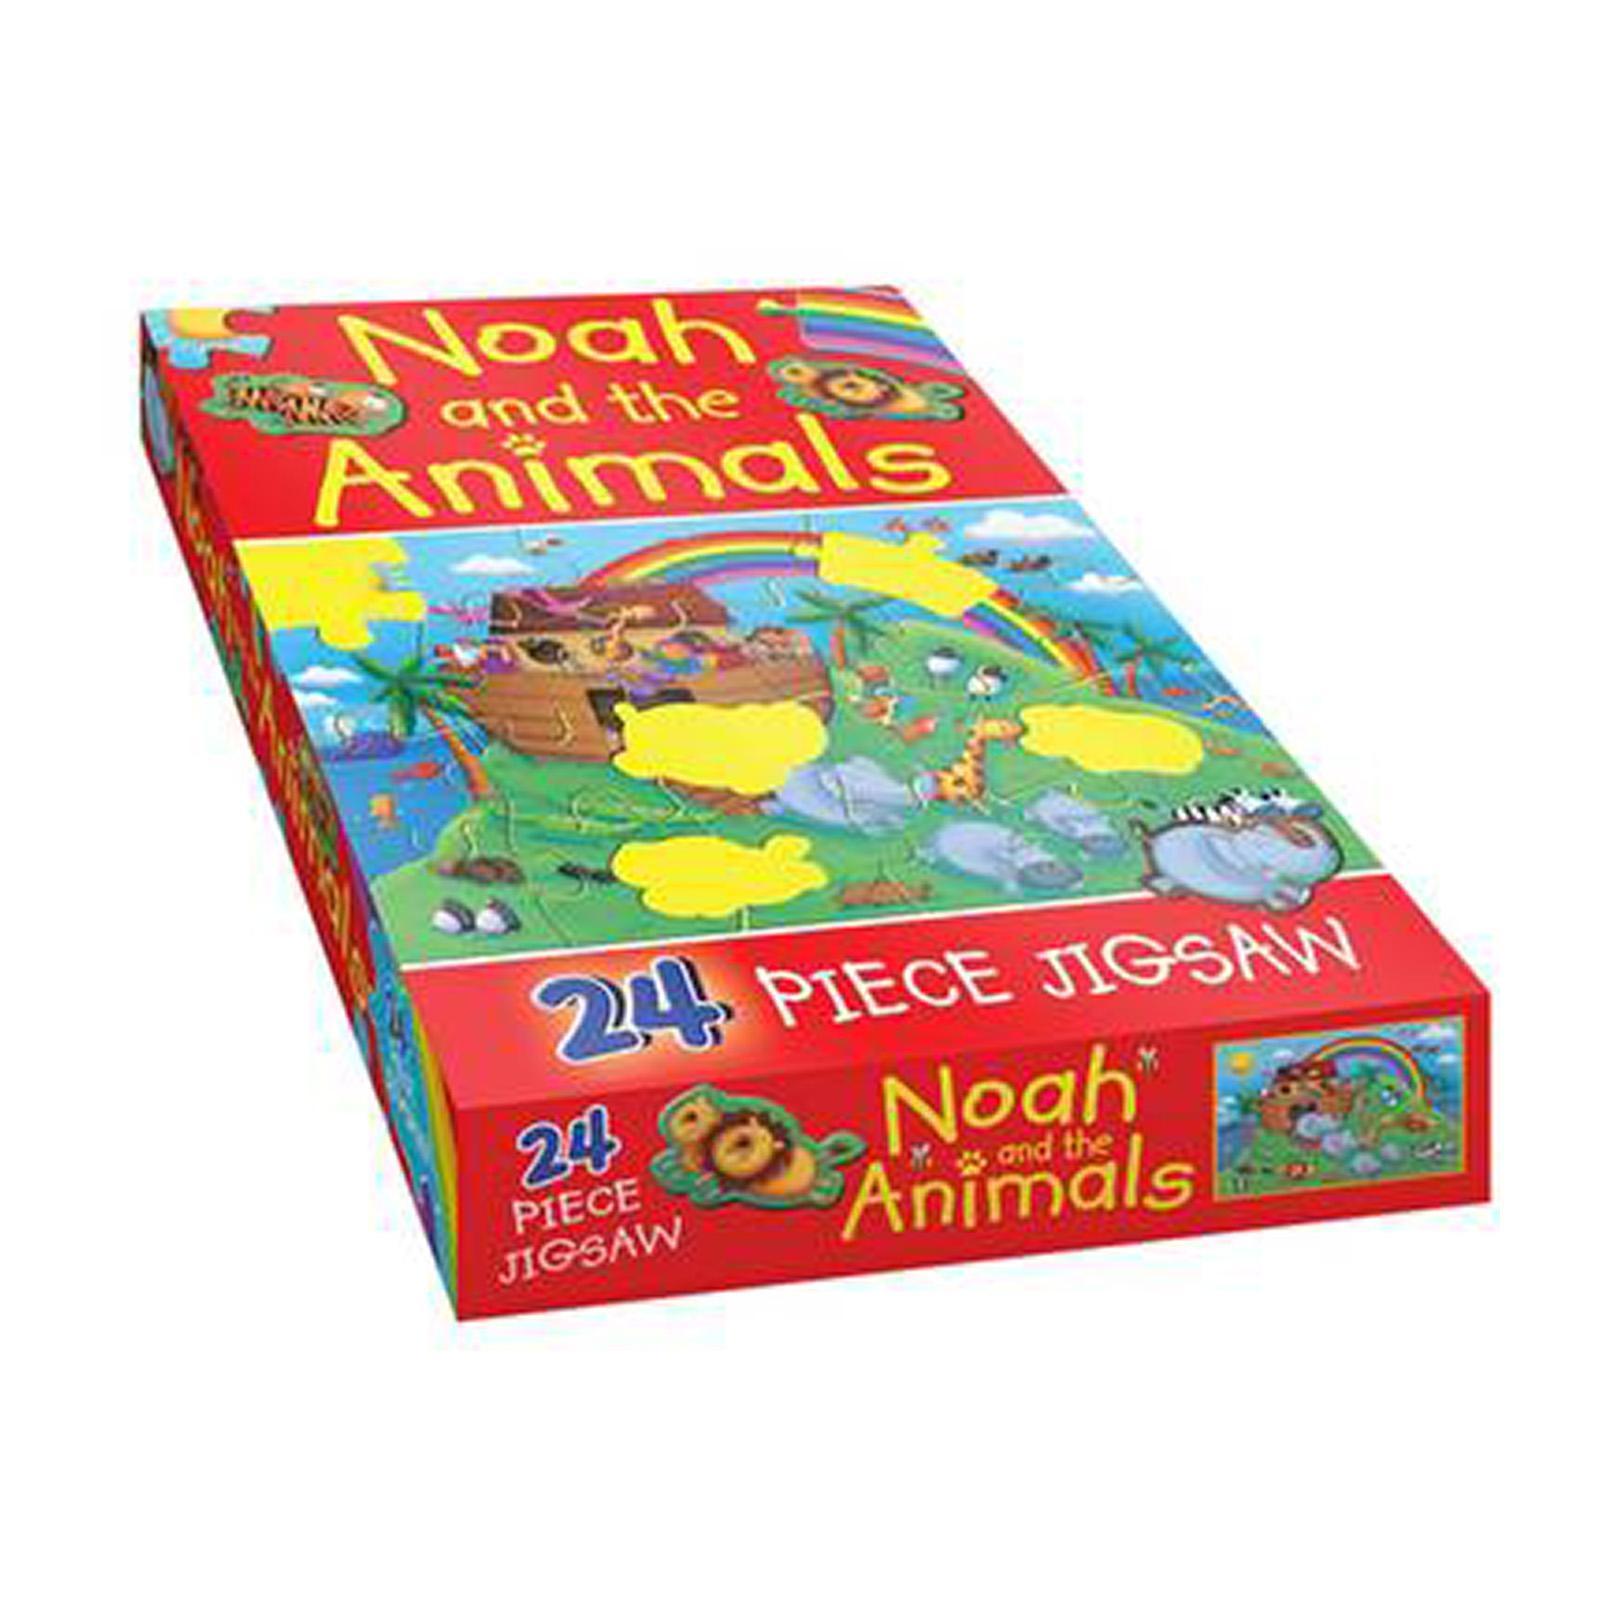 Noah And The Animals: 24 Piece Jigsaw